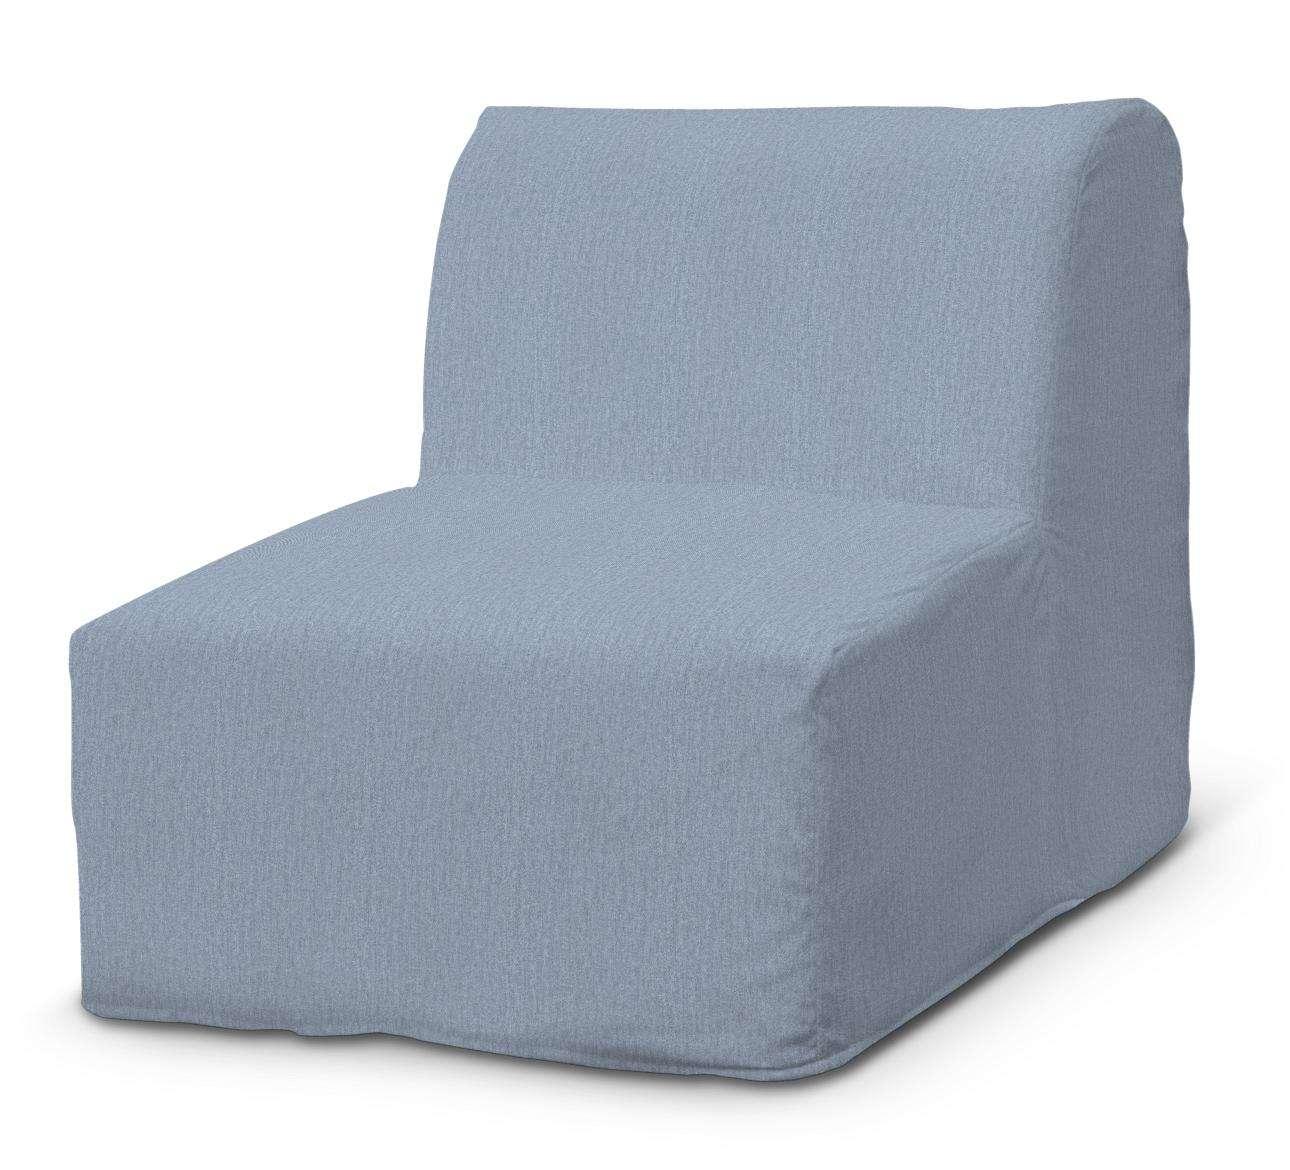 Pokrowiec na fotel Lycksele prosty fotel Lycksele w kolekcji Chenille, tkanina: 702-13